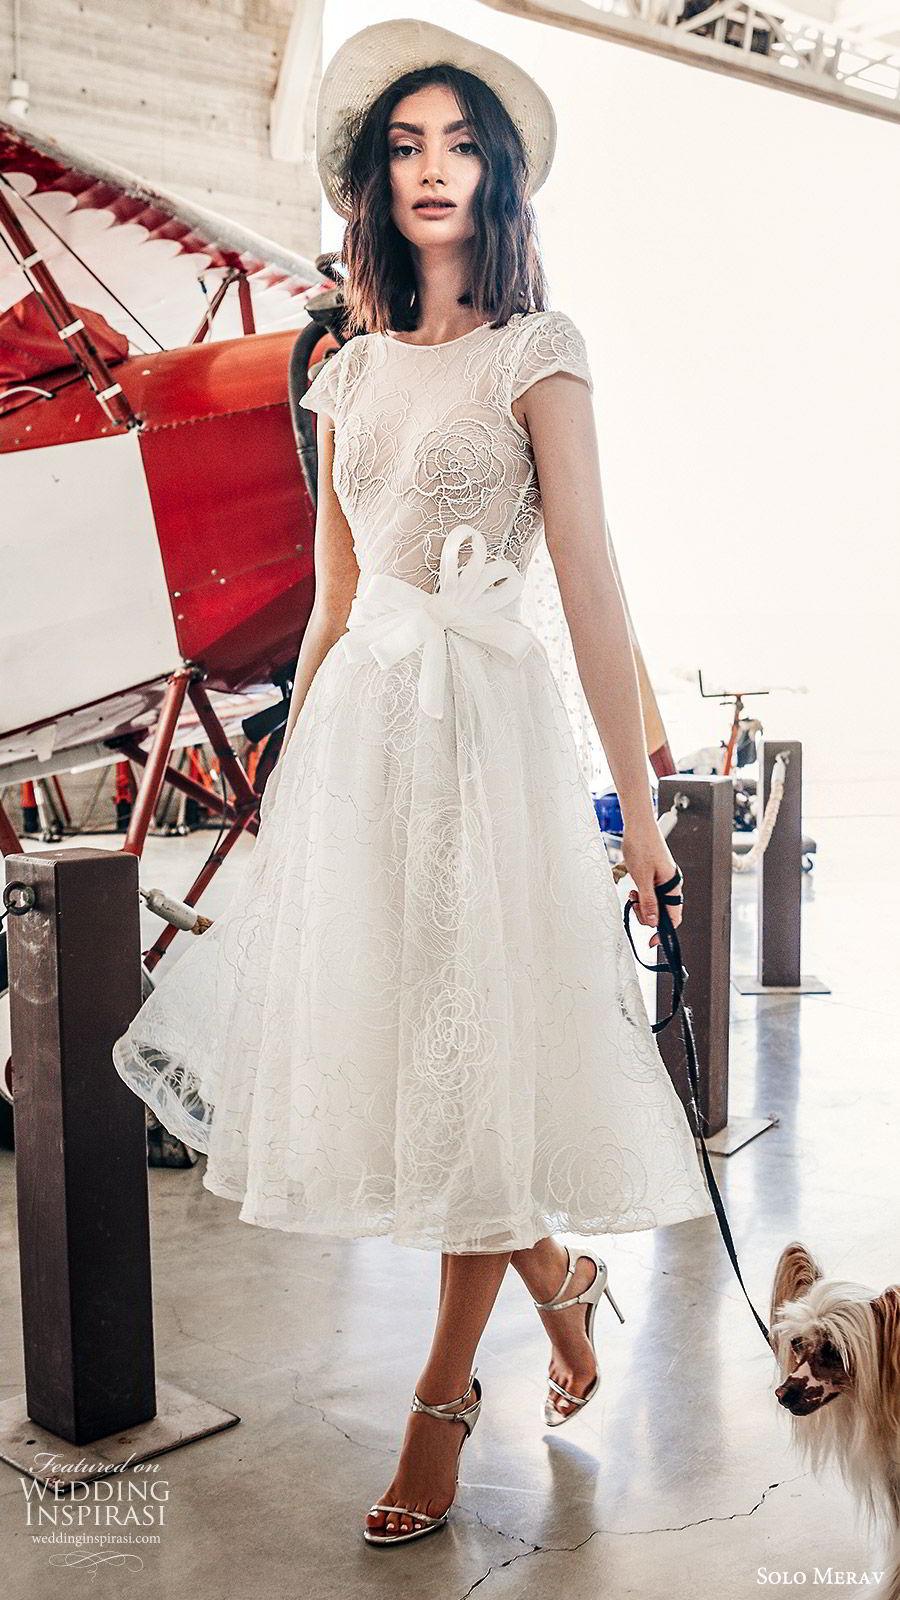 solo merav 2019 bridal cap sleeves jewel neckline sheer bodice embroidered a line tea length short wedding dress (10) mv vintage romantic